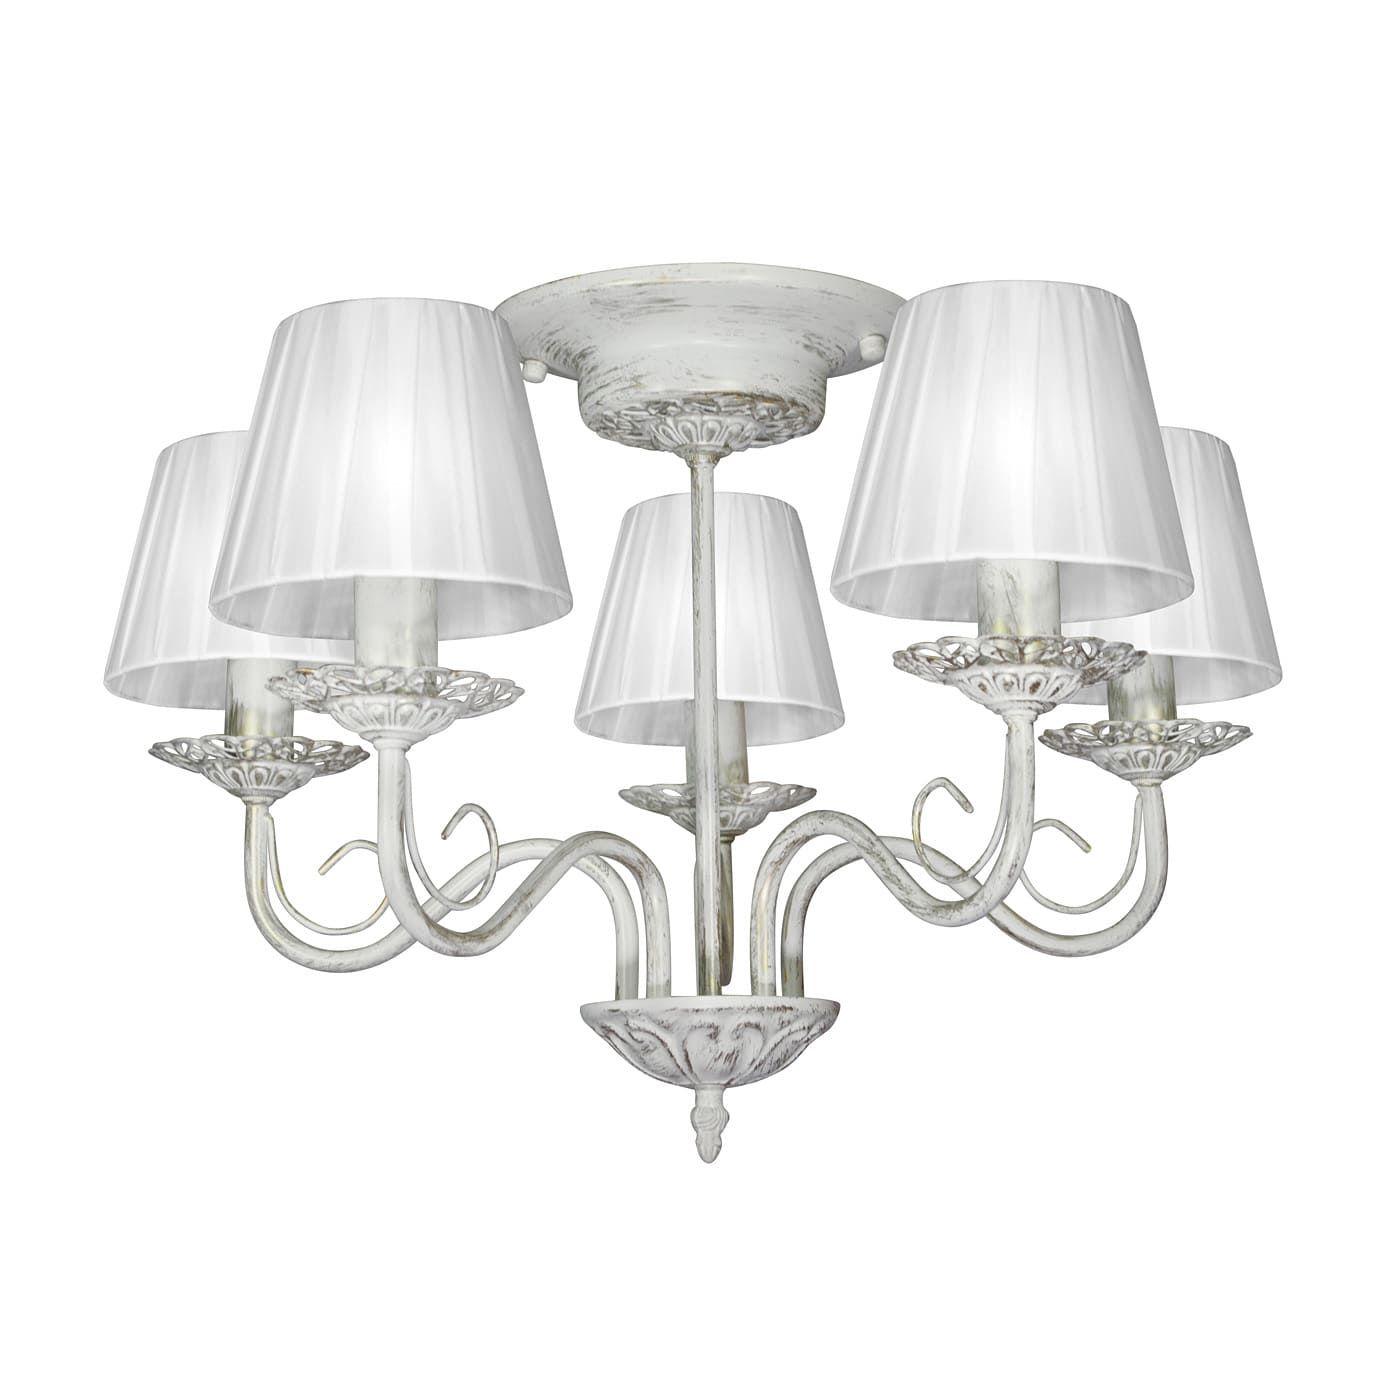 PETRASVET / Ceiling chandelier S1157-5, 5xE14 max. 60W